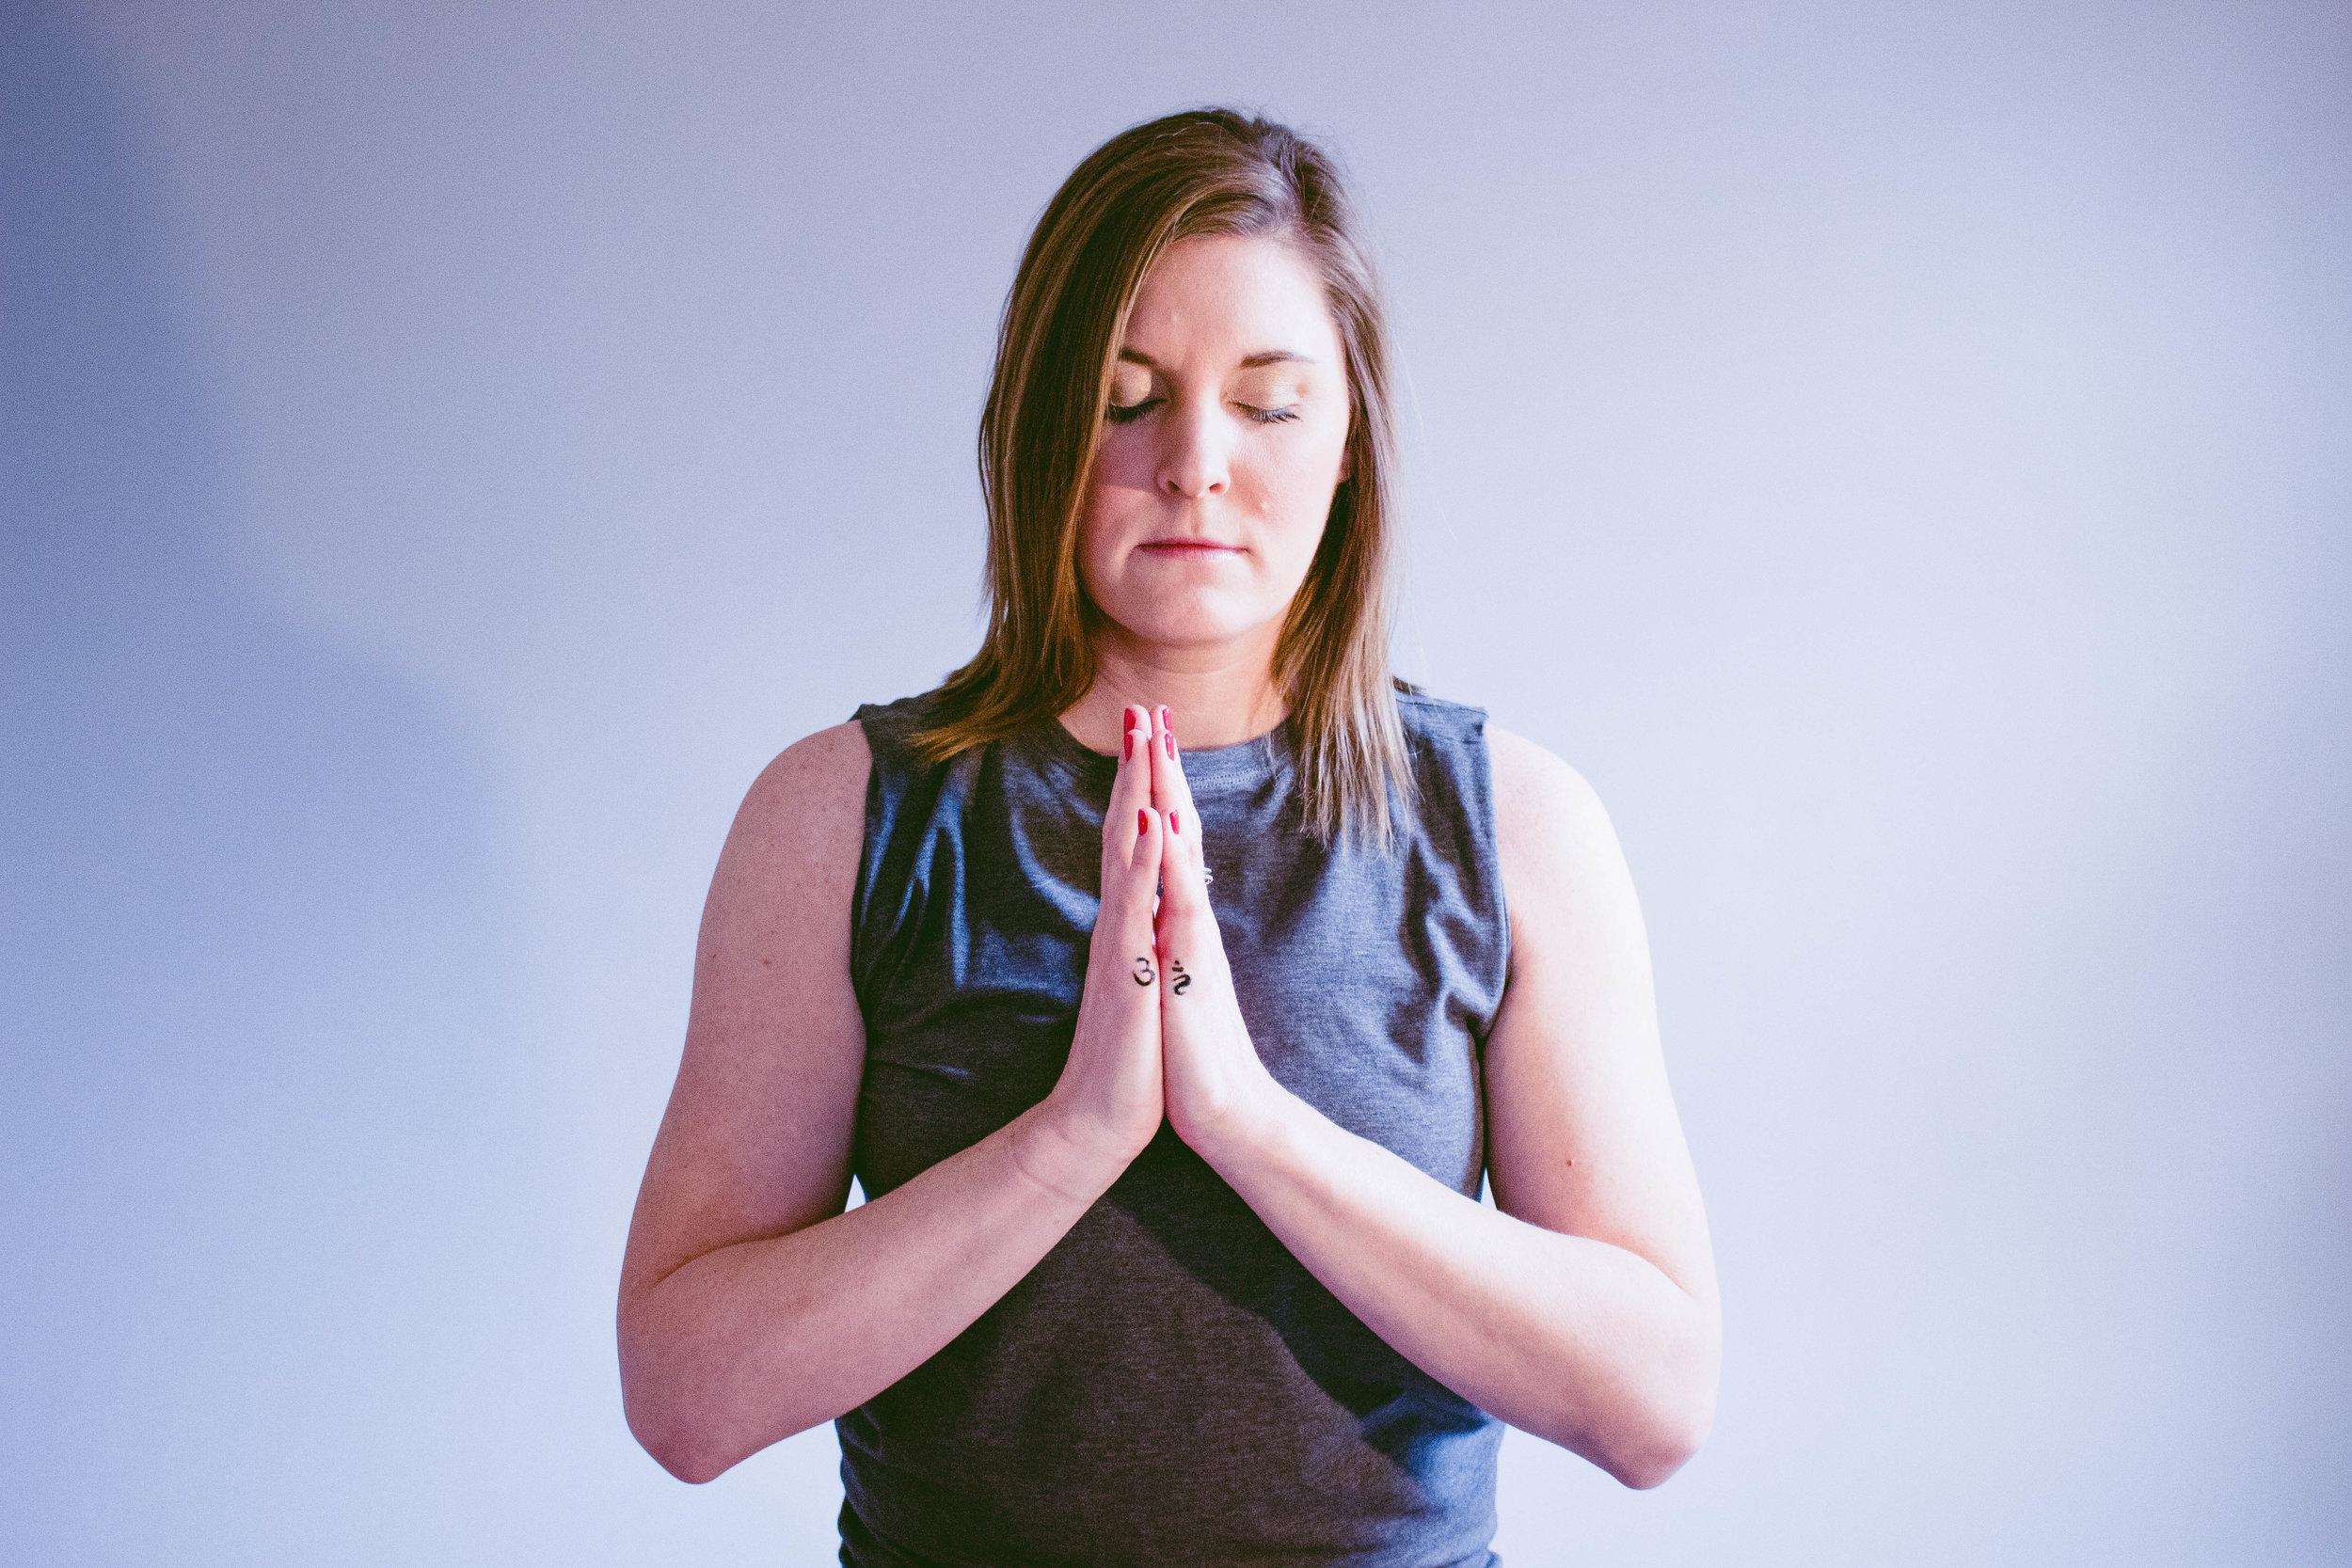 yoga-portrait-photo-poses